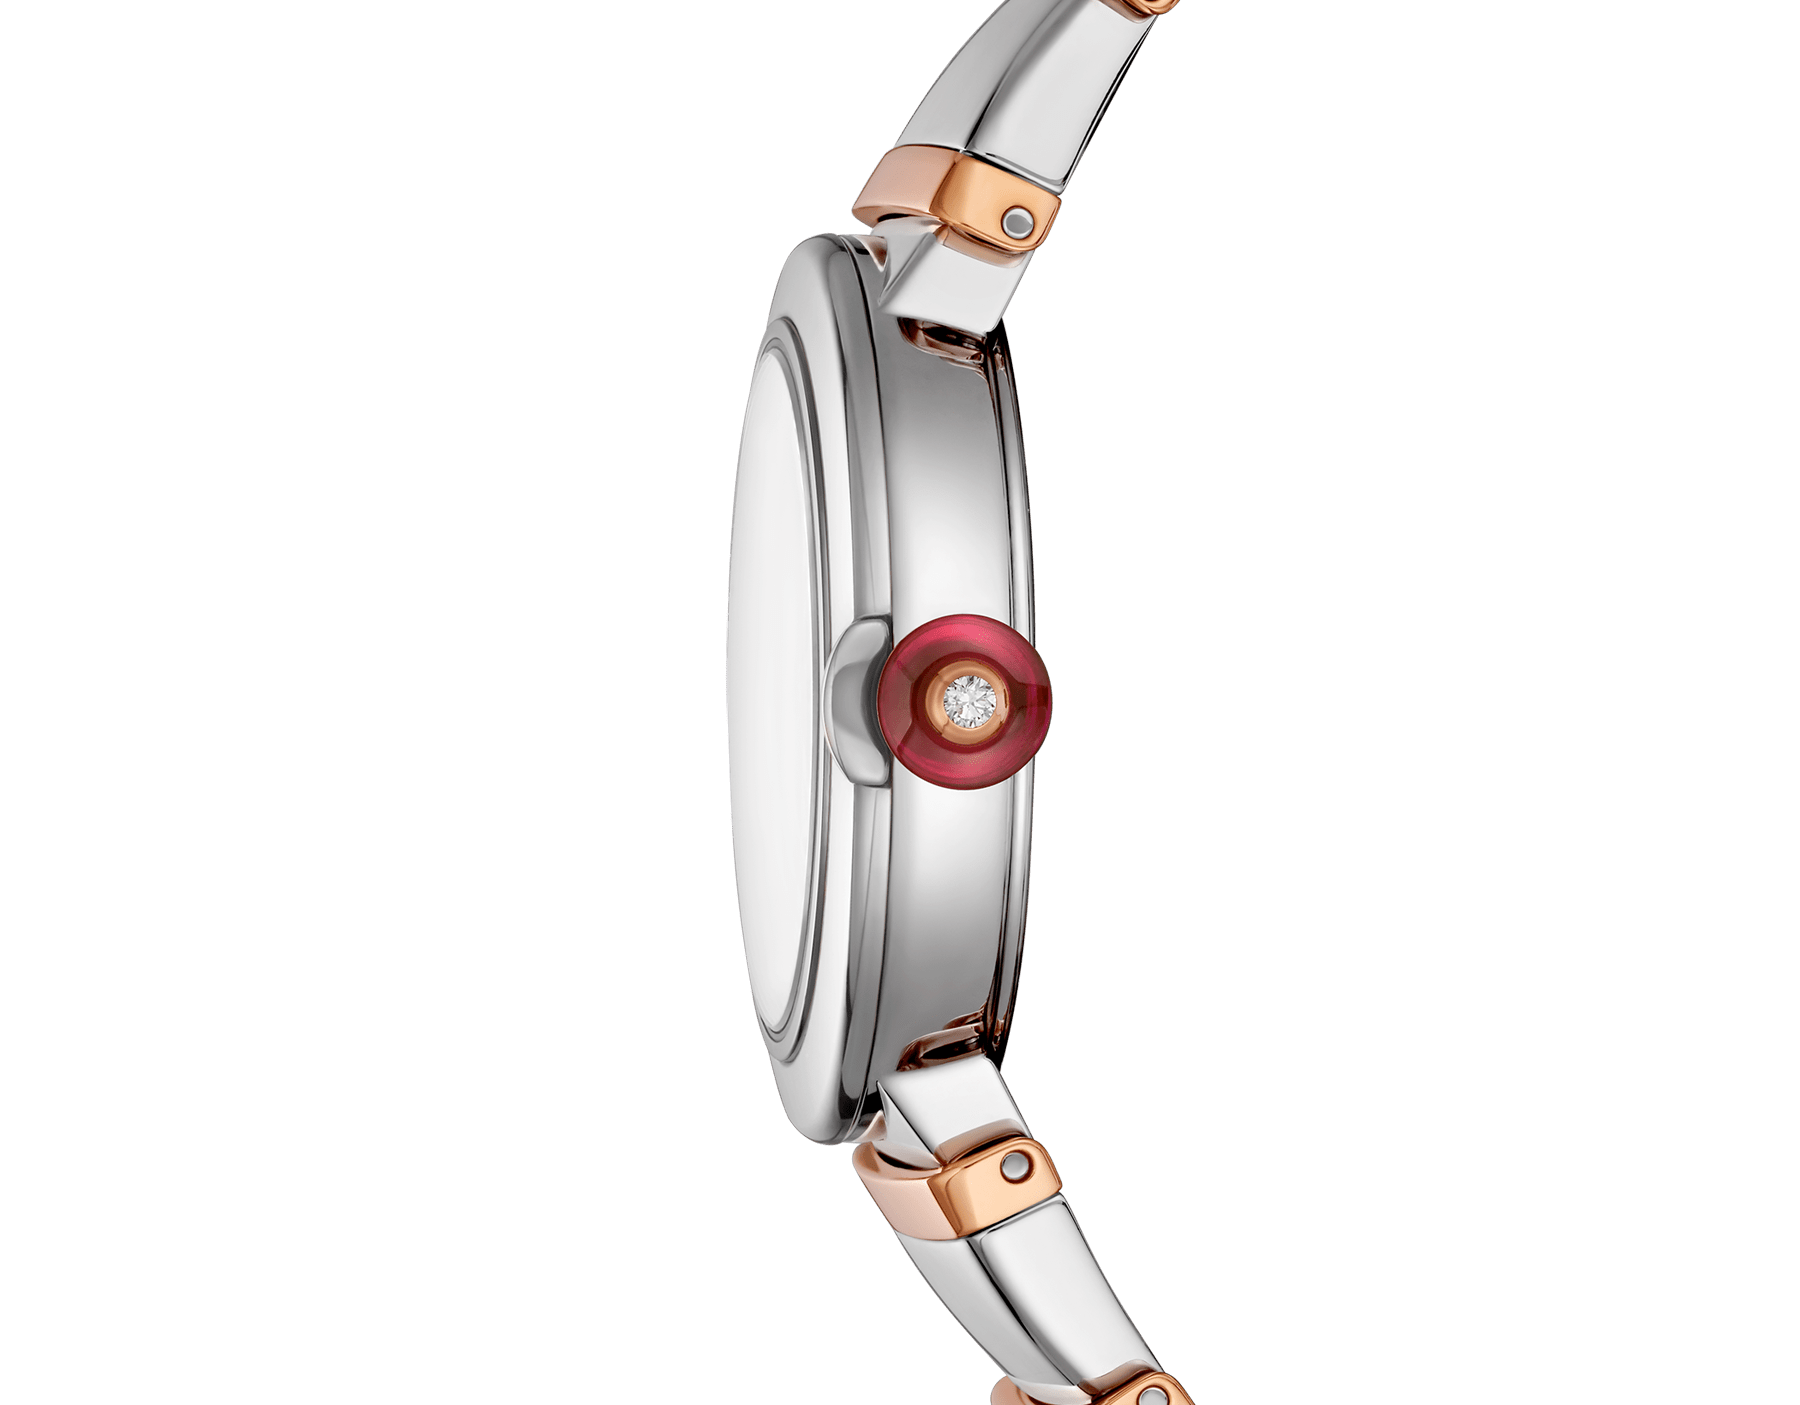 Montre LVCEA avec boîtier en acier inoxydable, cadran en opaline argentée et bracelet en or rose 18K et acier inoxydable. 102193 image 3